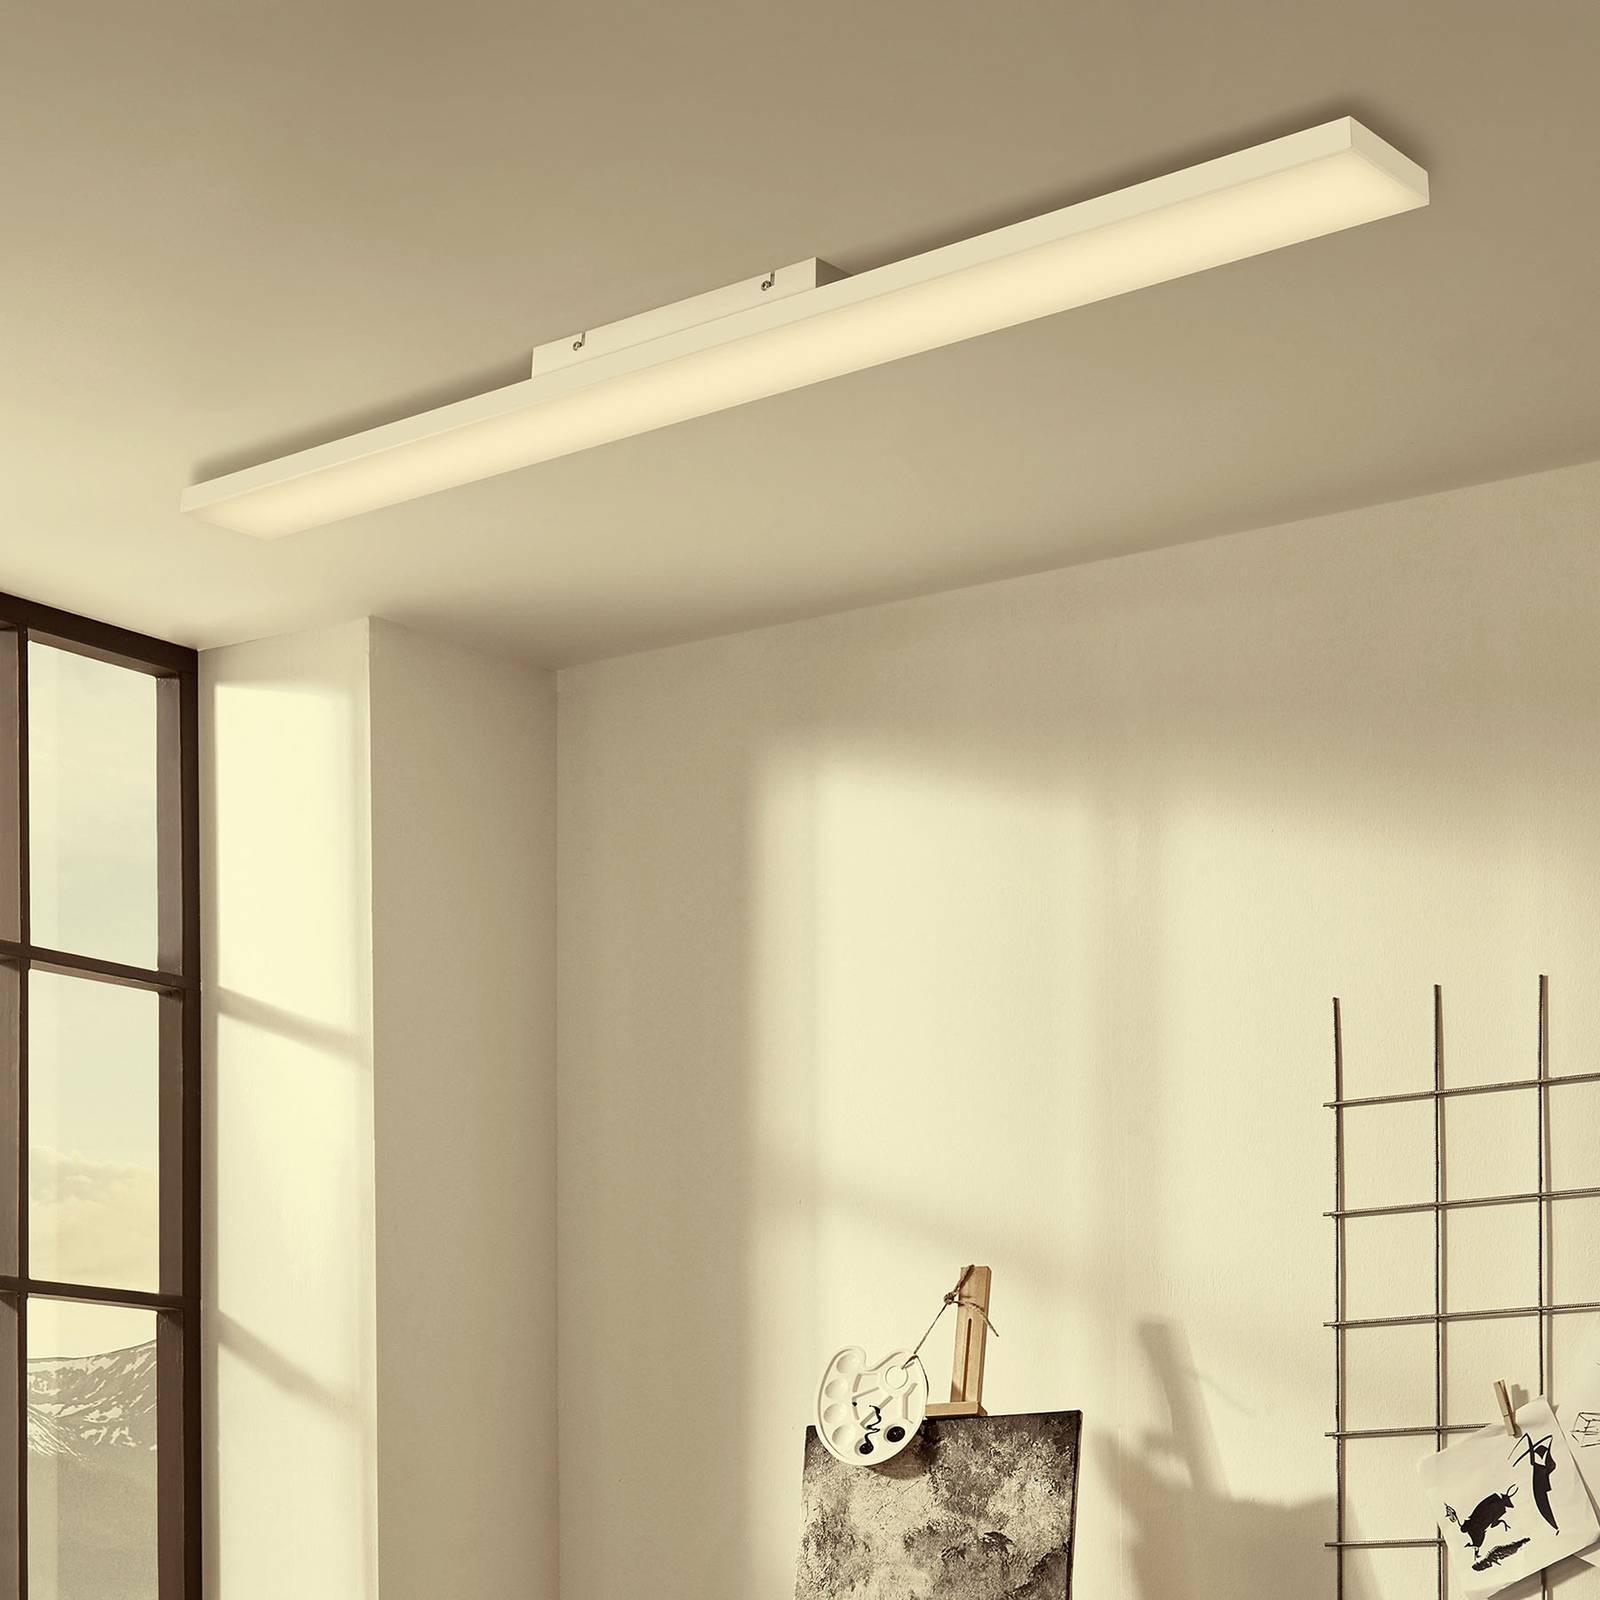 LED-kattovalaisin Frameless RGBW, 120x10cm